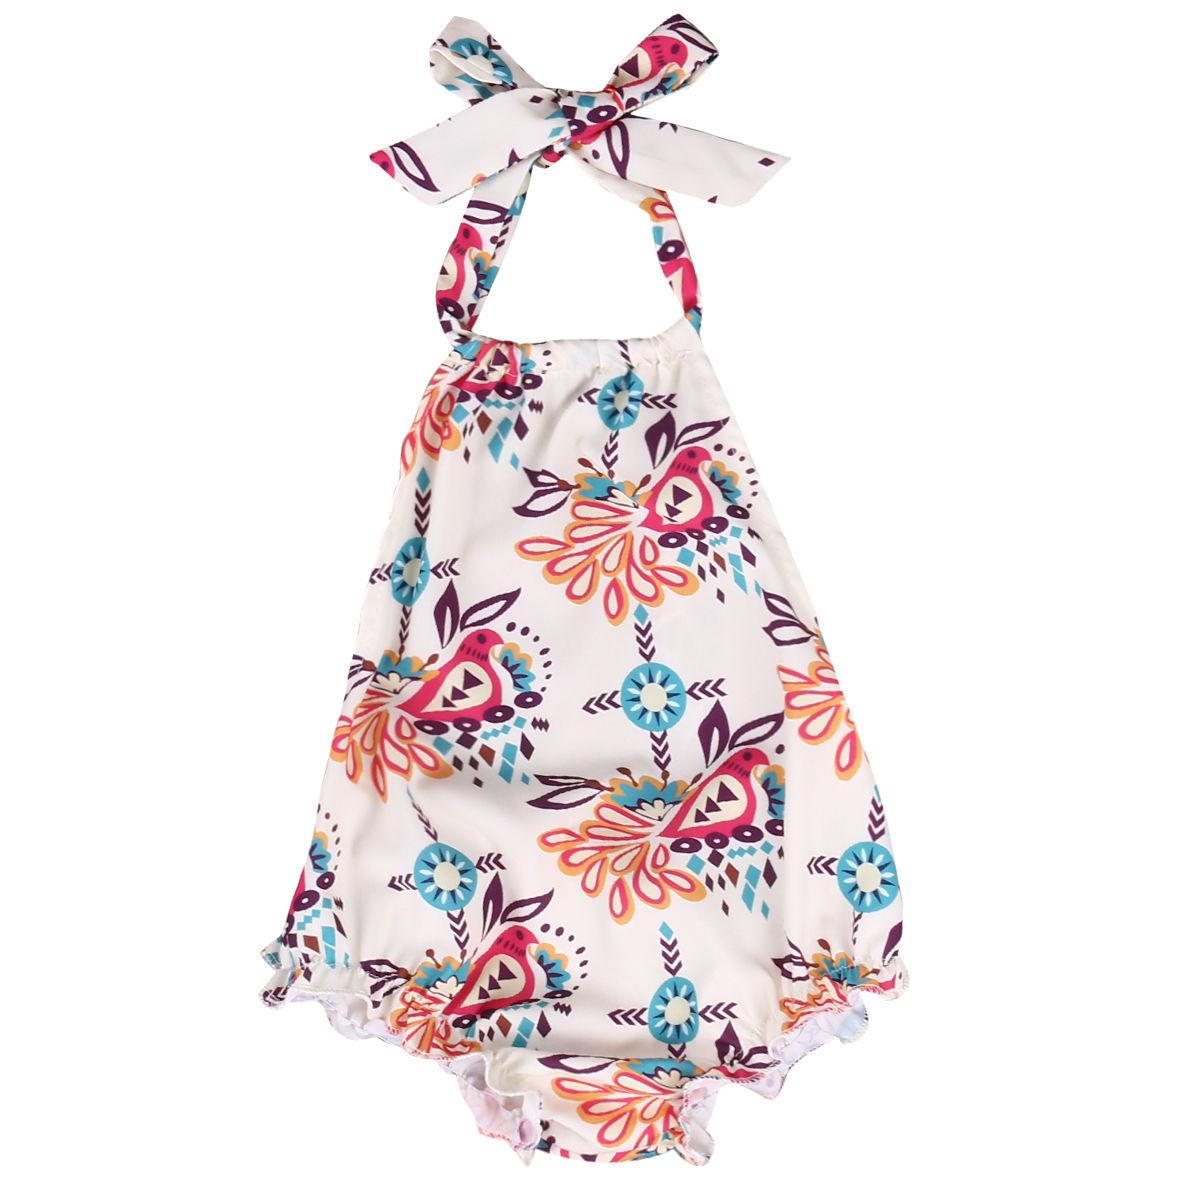 Helen115 Pretty Newborn Baby Girls Summer Floral Printed Sleeveless Leak Back Belt Bodysuit 0-18M